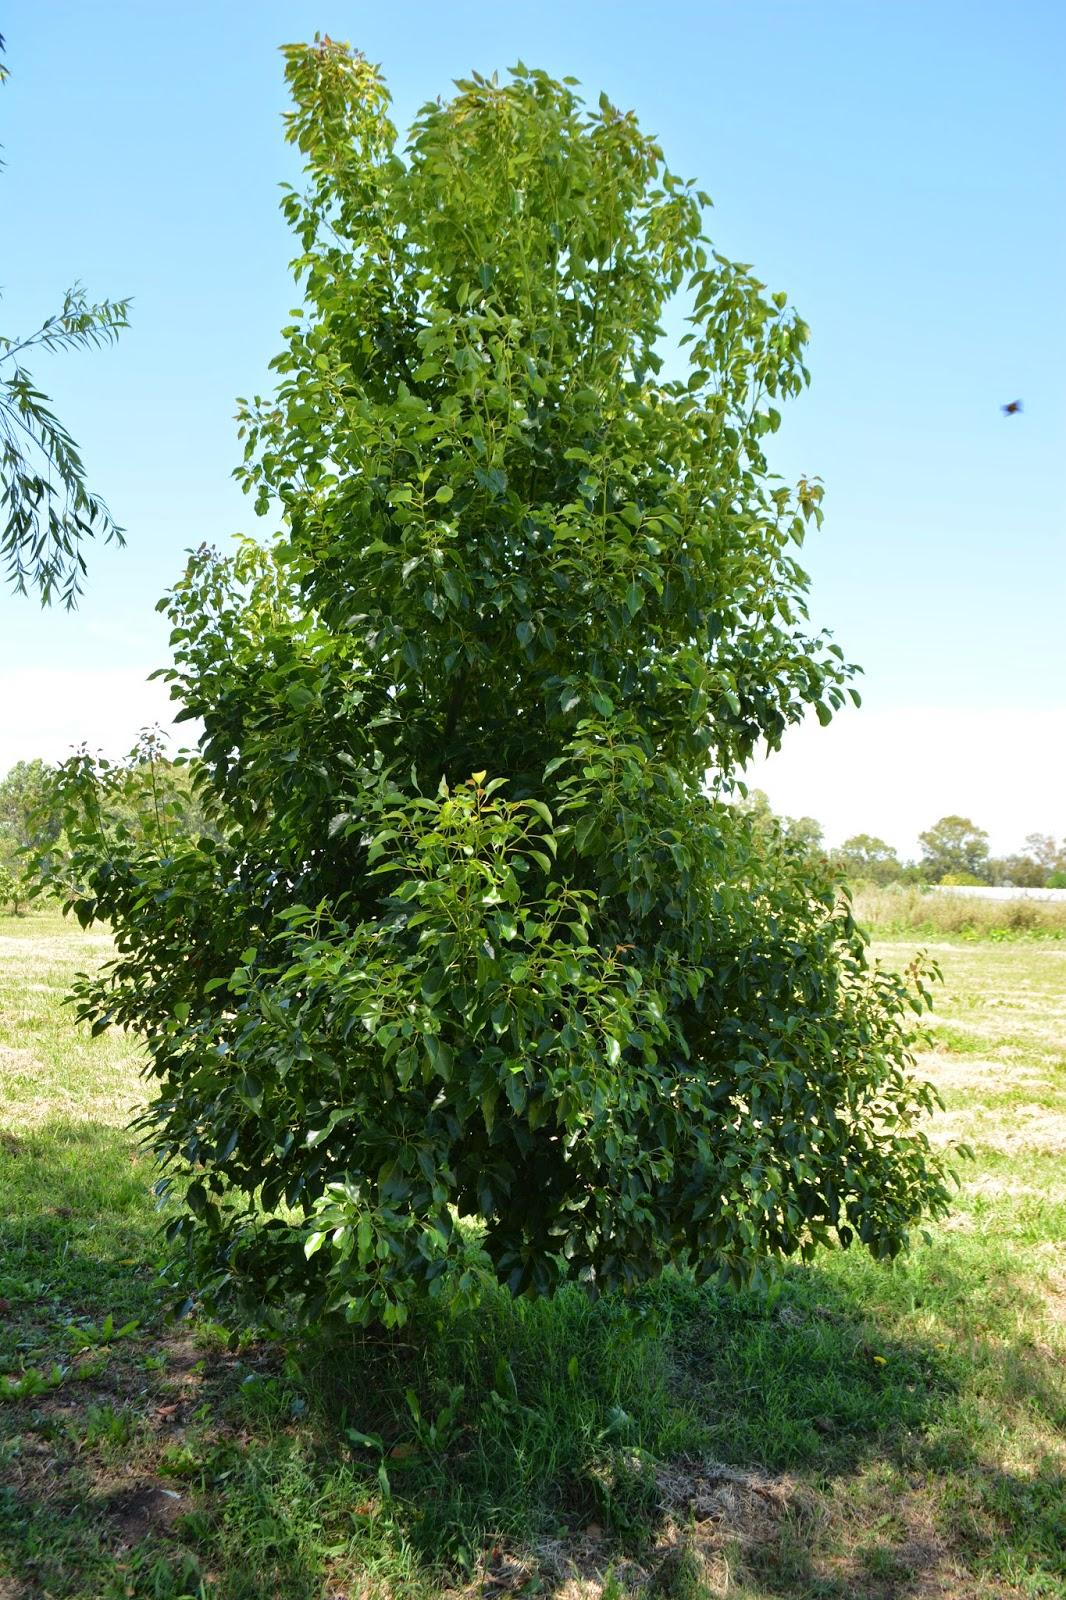 Cinnamomum glanduliferum- Falso Alcanfor